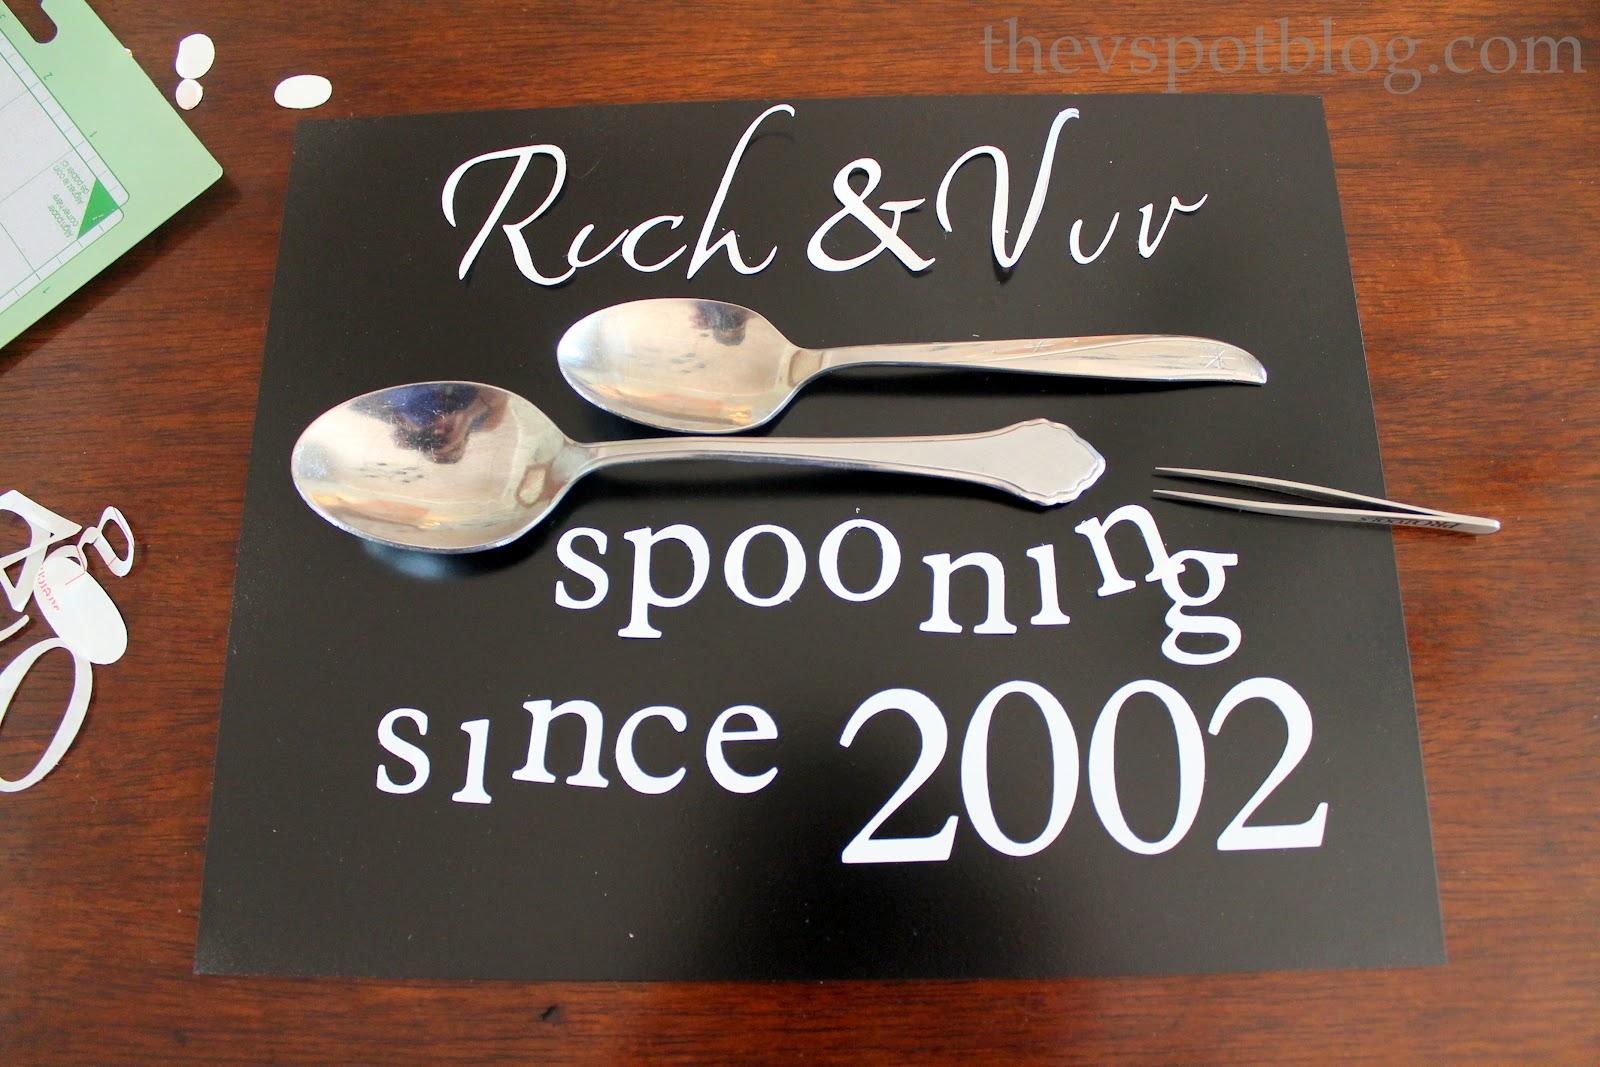 Unique 25th Wedding Anniversary Gifts: A DIY, Personalized Wedding Or Anniversary Gift For Less